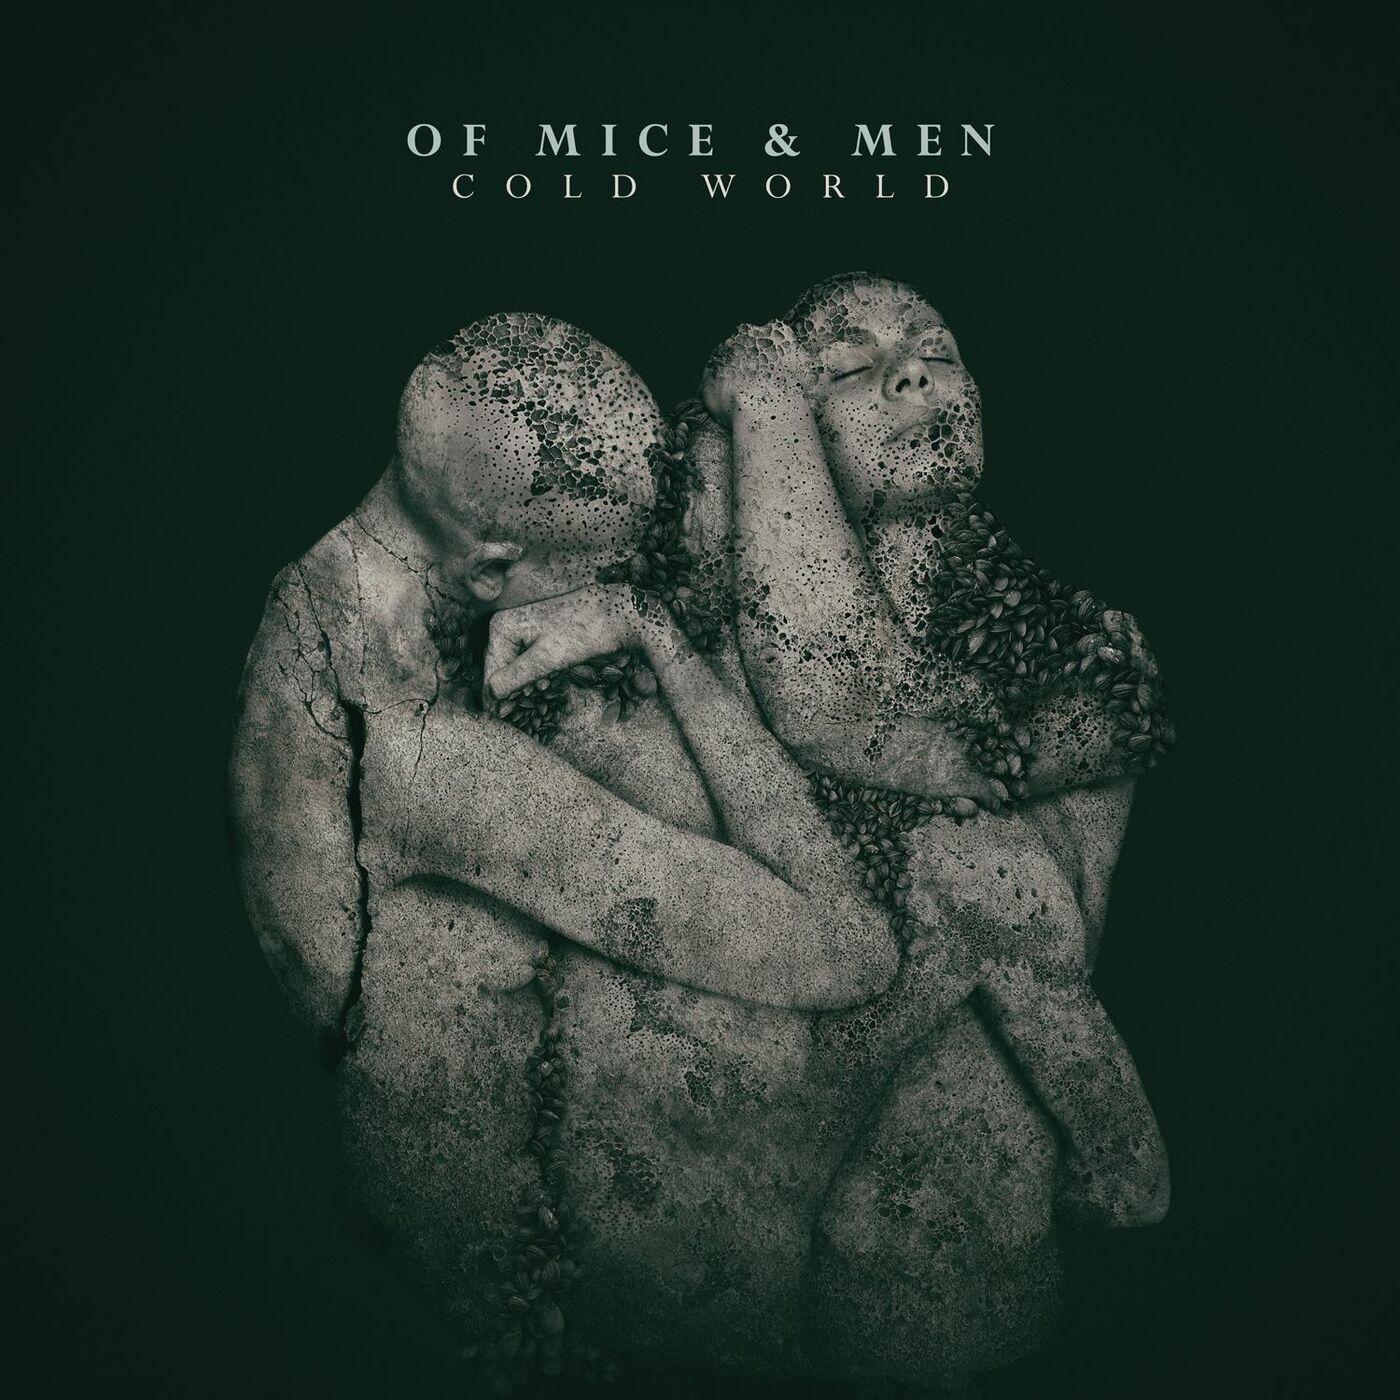 Of Mice & Men - Contagious [single] (2016)